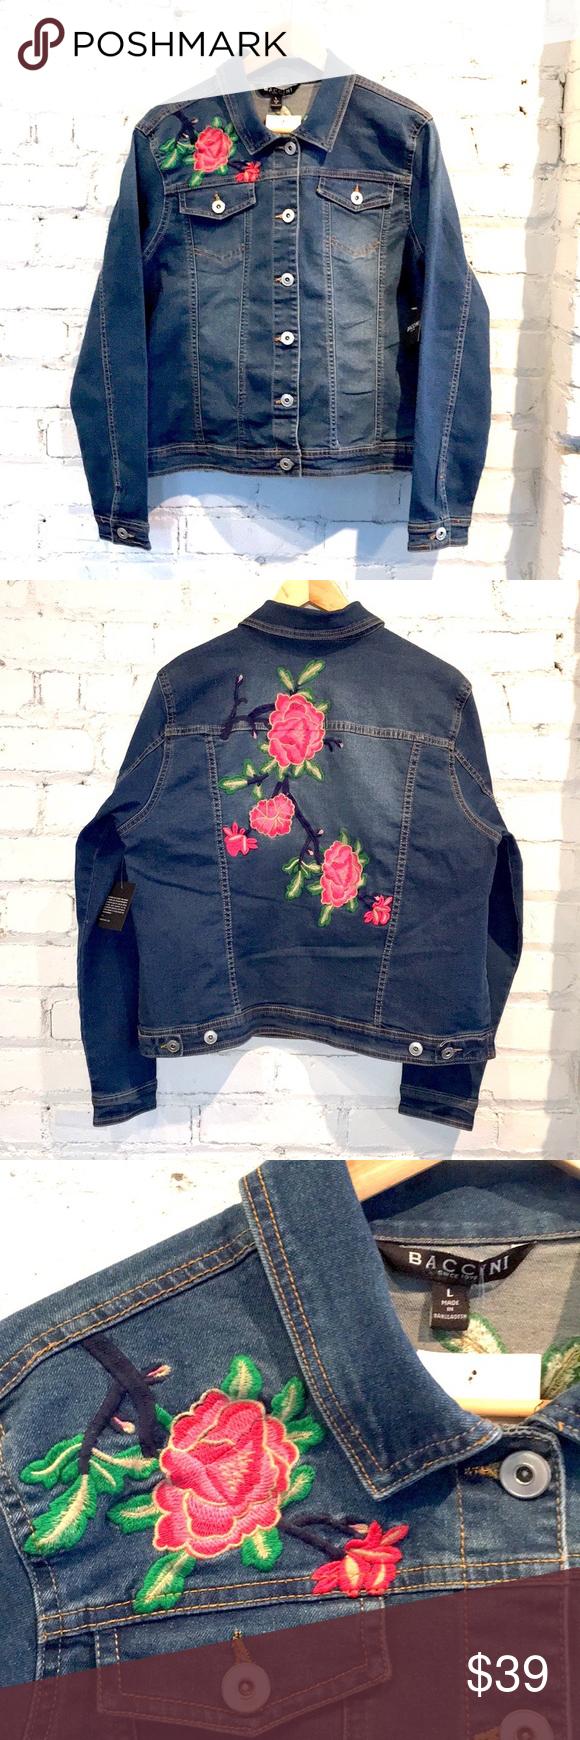 Baccini Embroidered Denim Jean Jacket Size L Embroidered Denim Clothes Design Fashion Design [ 1740 x 580 Pixel ]